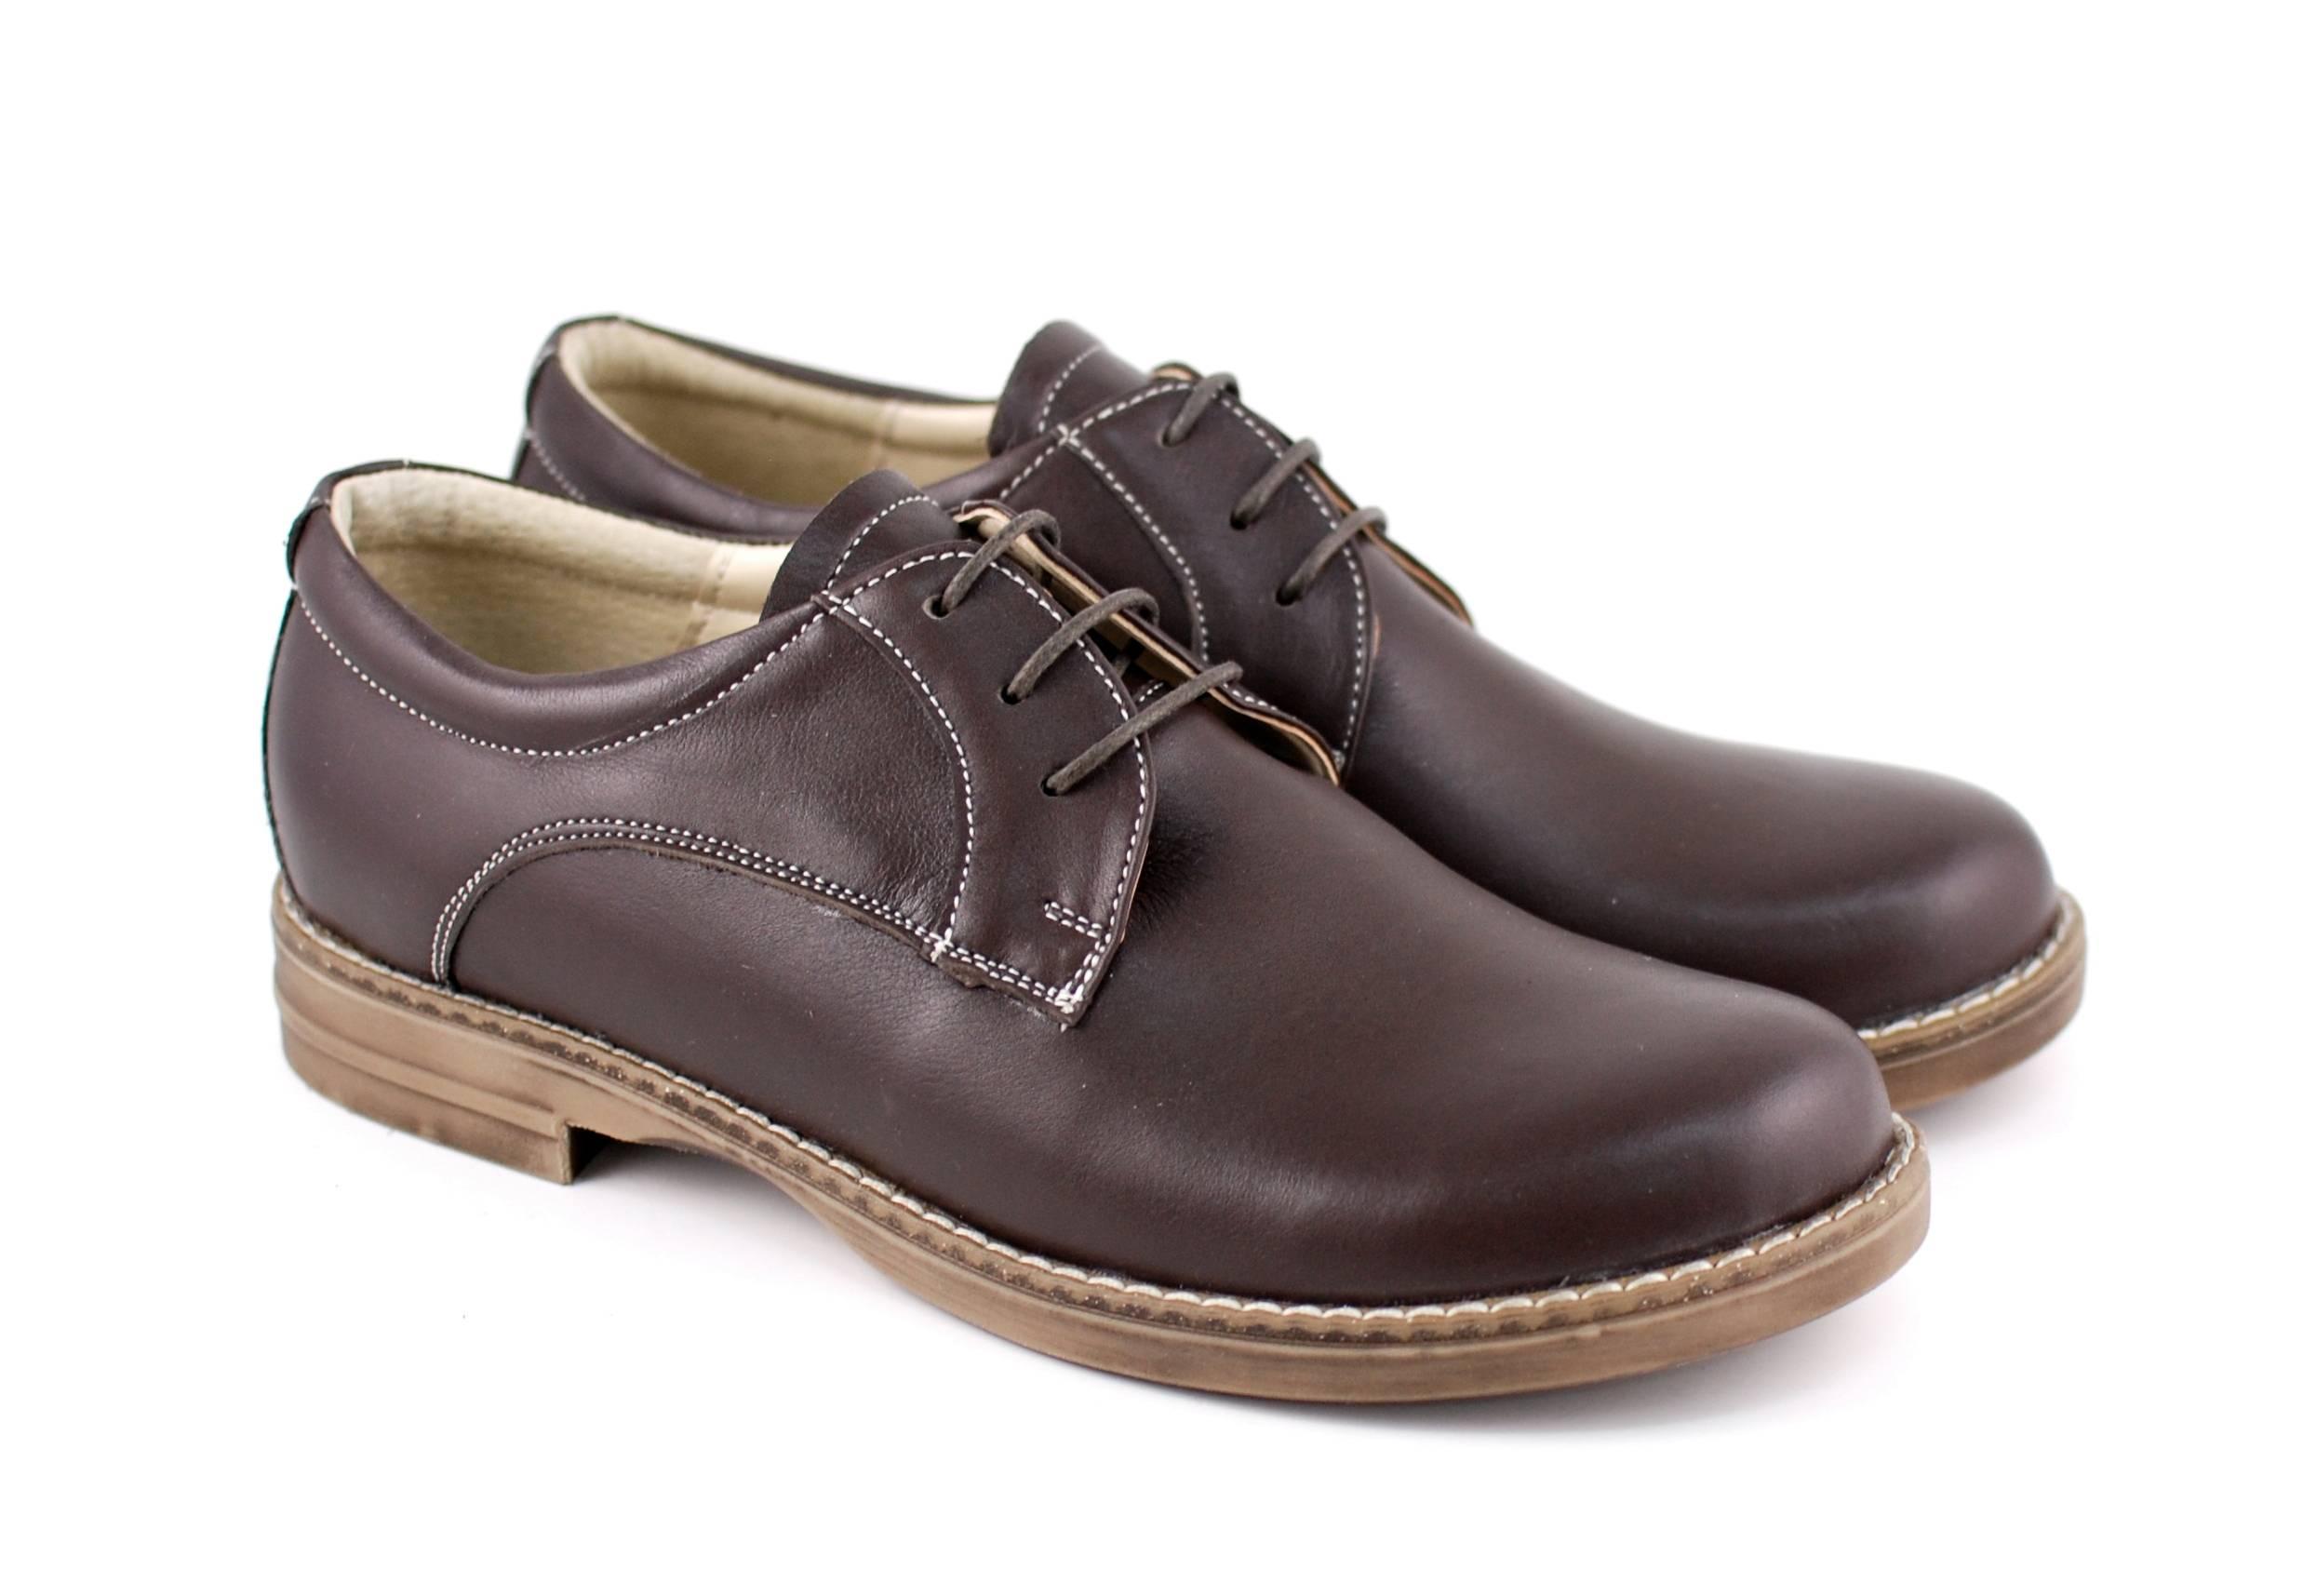 Pantofi dama casual din piele naturala maro box - P10MBOX